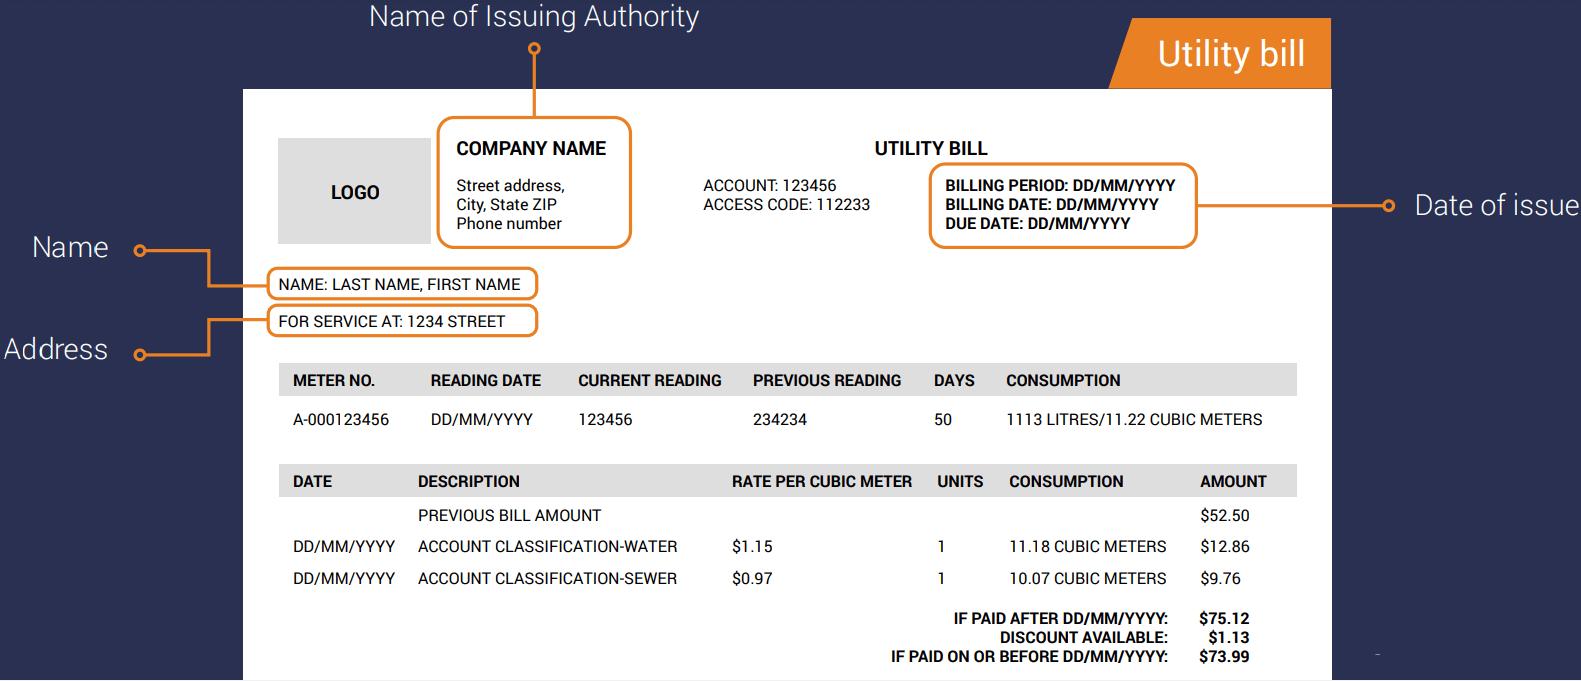 How to Verify Account in Binary.com